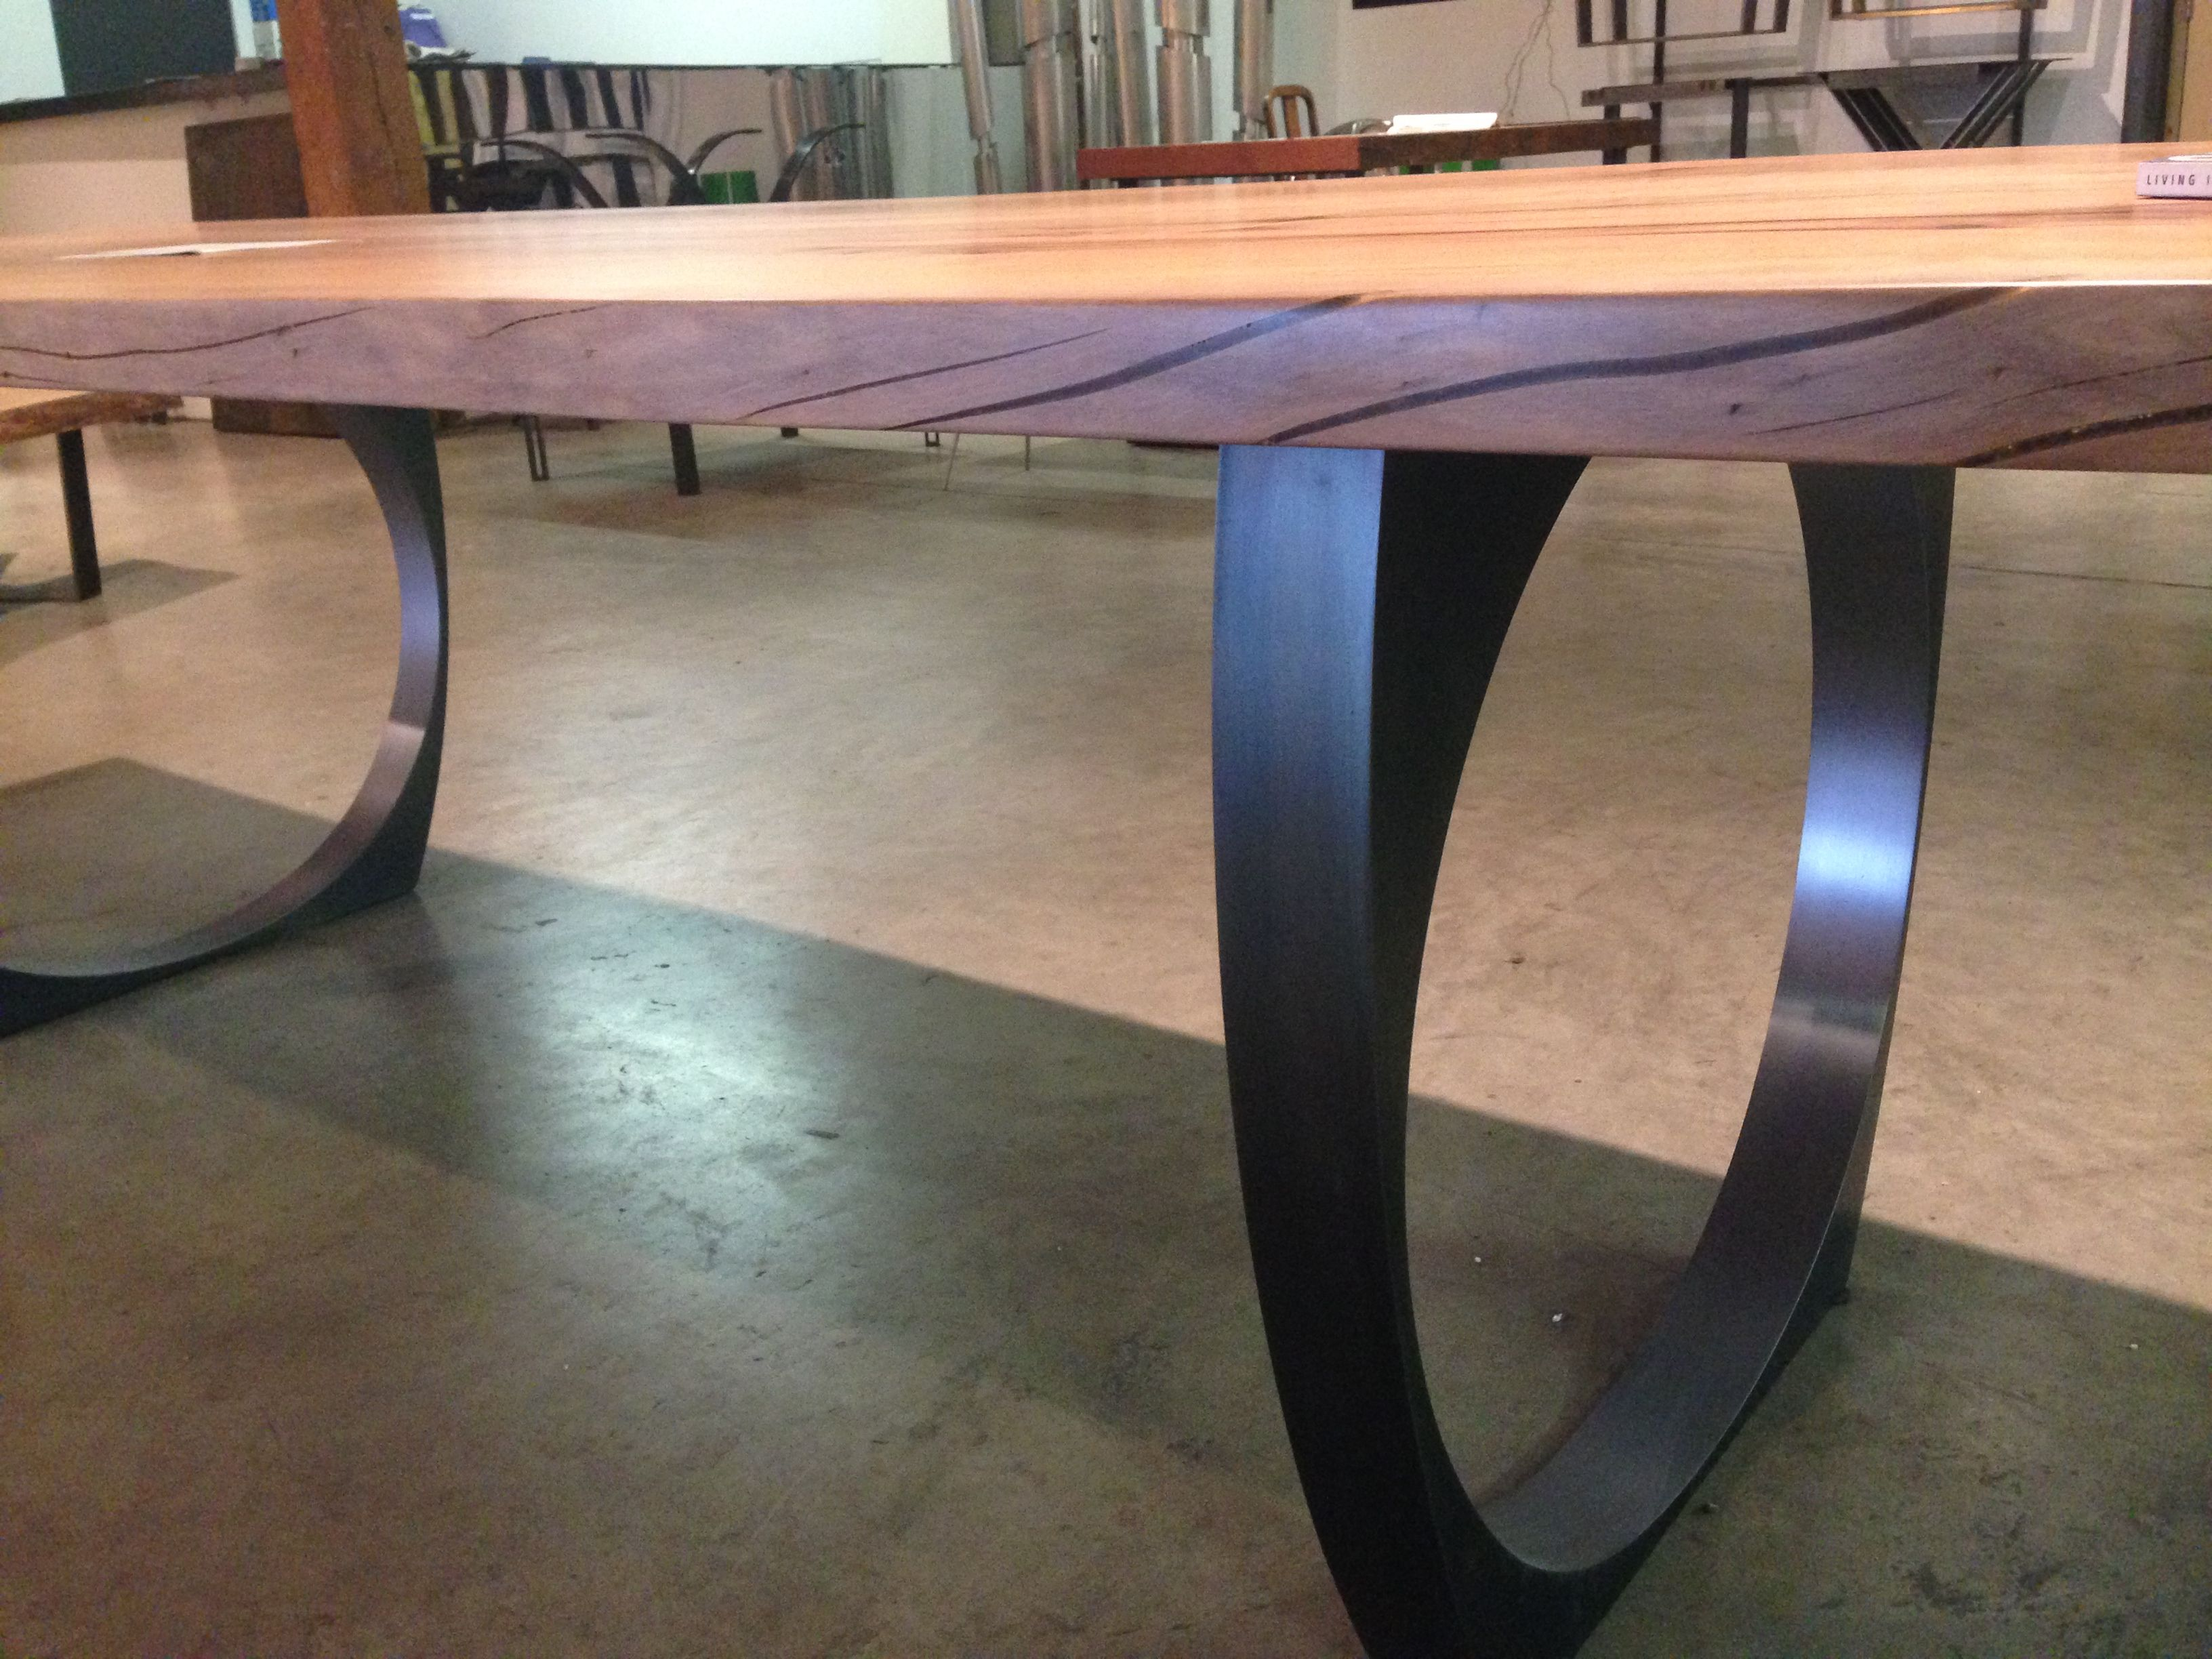 blackened steel table legs  Shine Penthouse  Pinterest  Legs, Tables and Steel